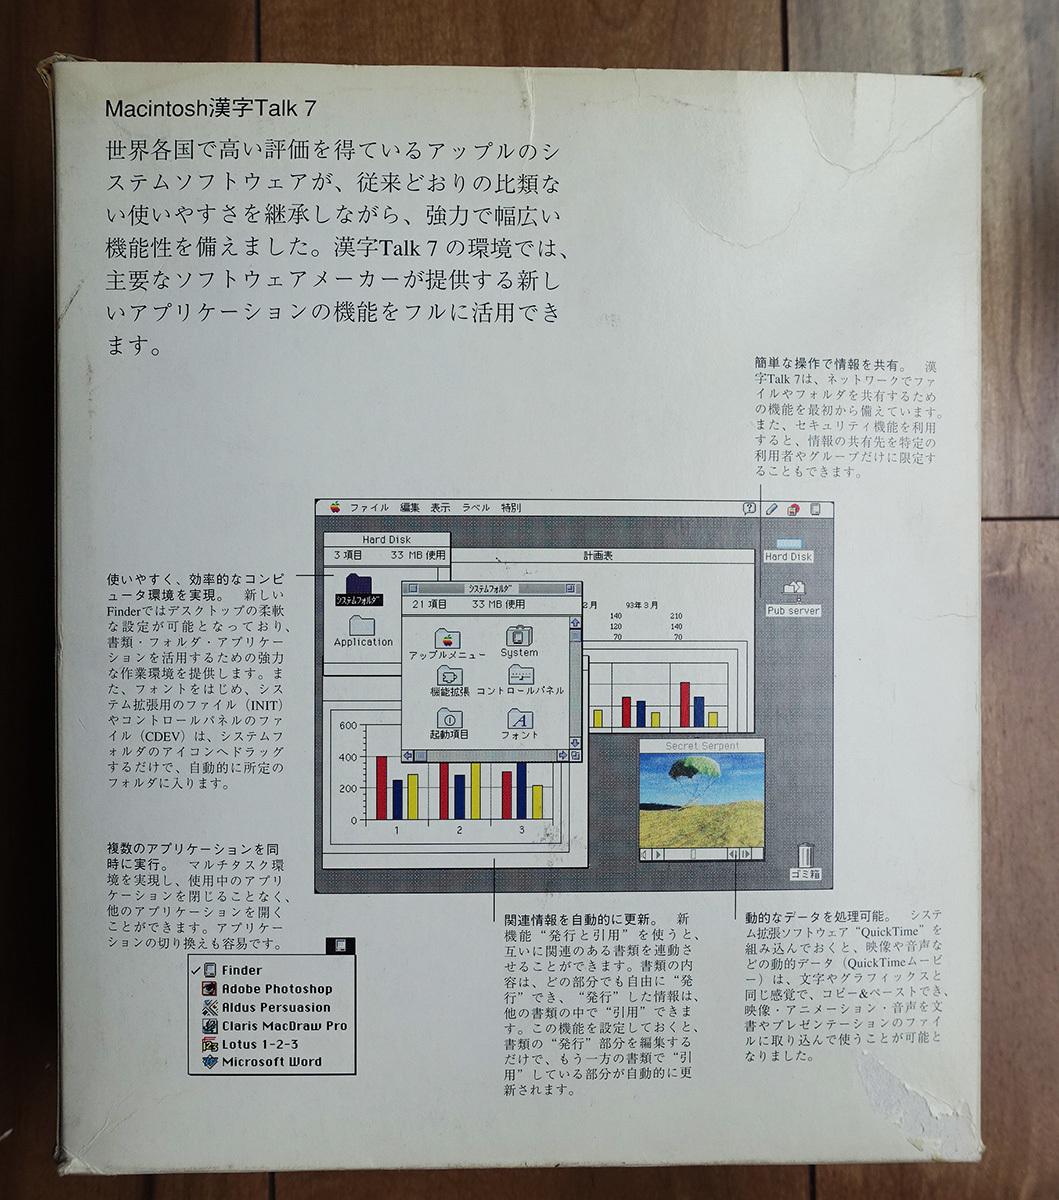 Apple Macintosh 漢字Talk7 アップグレードキット_画像4